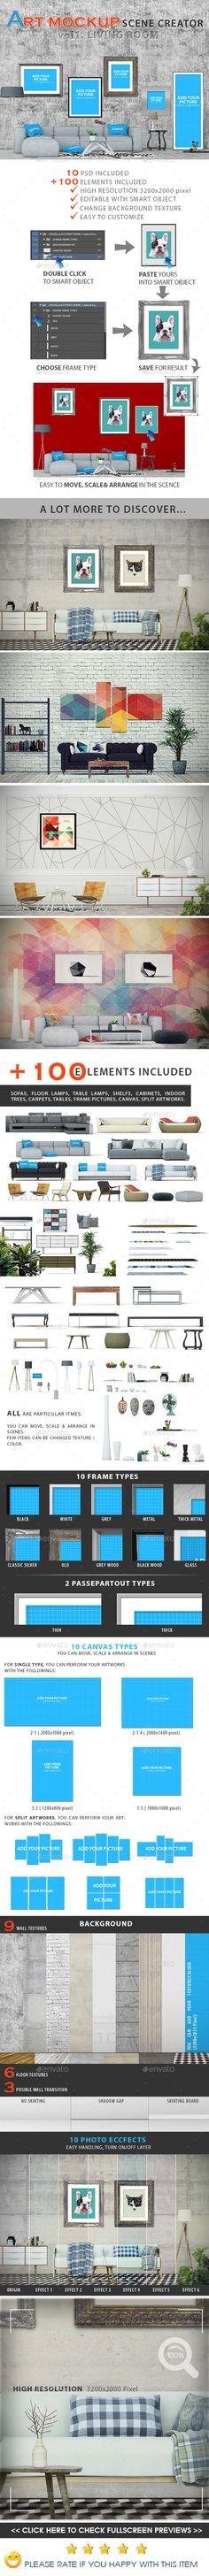 Scences Creator Art Mockup_ LivingroomArt Mockup Scences Creator _ Living room is easy and simple way that you create your own li